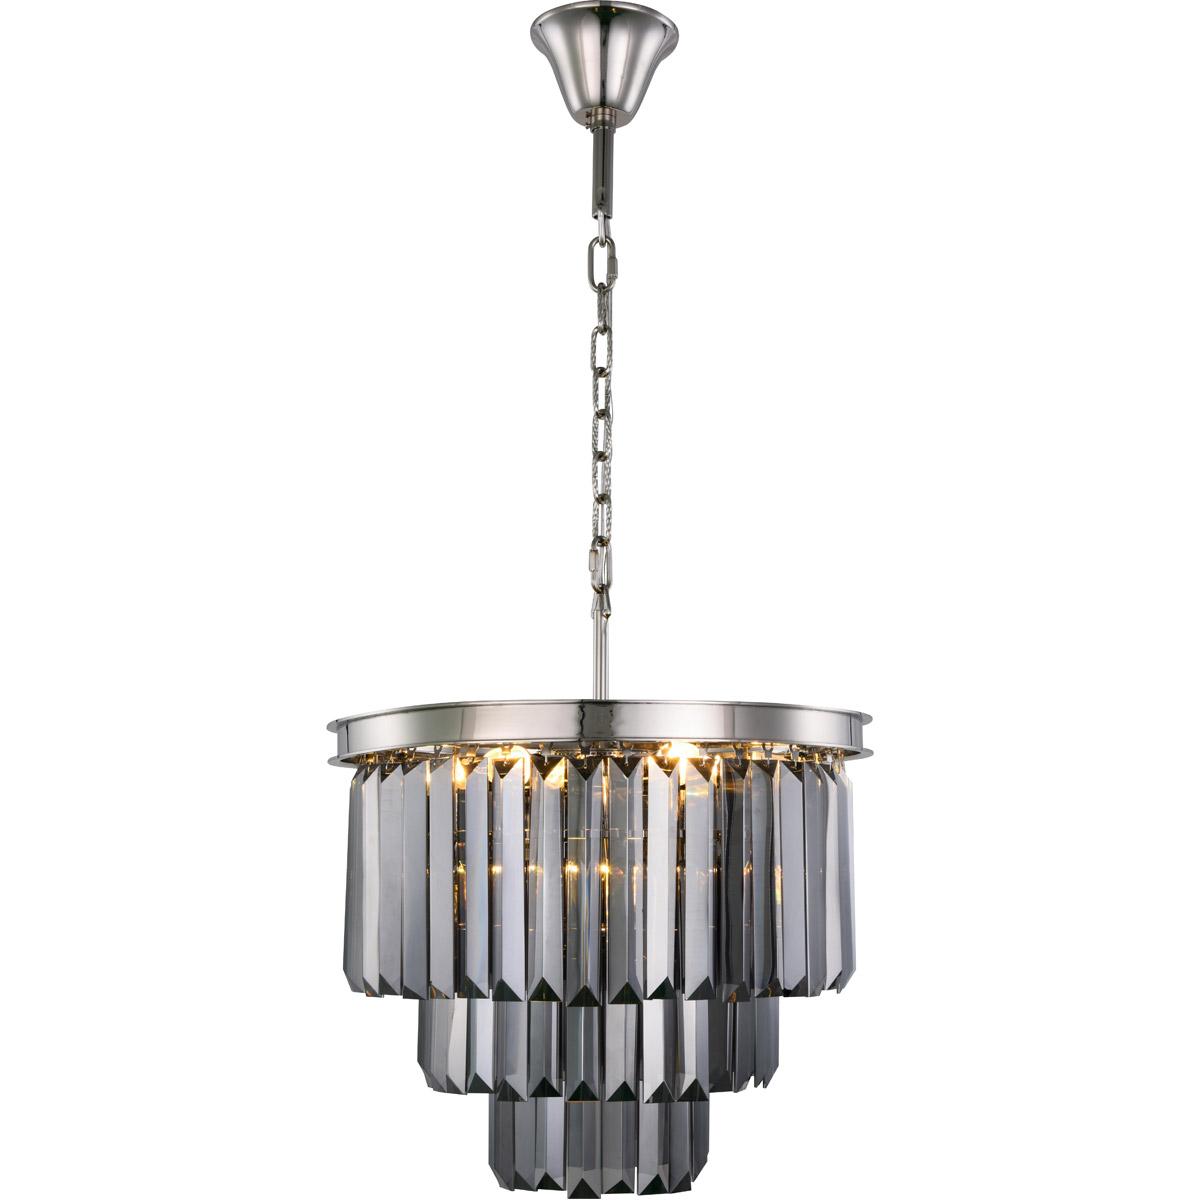 Elegant lighting 1231d20pn ssrc sydney chandeliers polished nickel responsive image aloadofball Choice Image